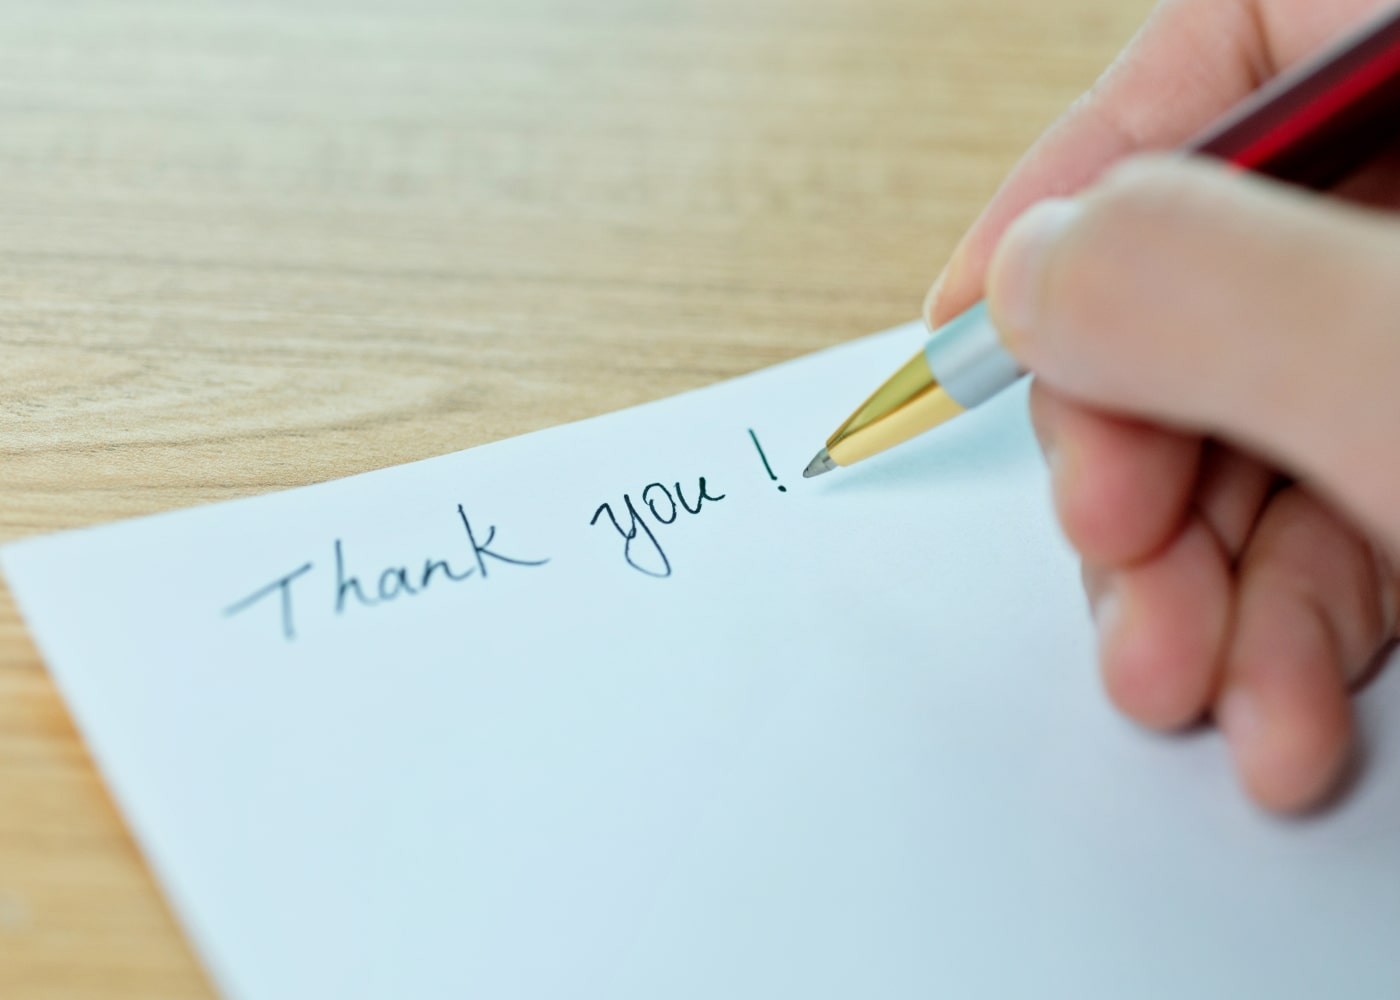 Business communication - handwritten note